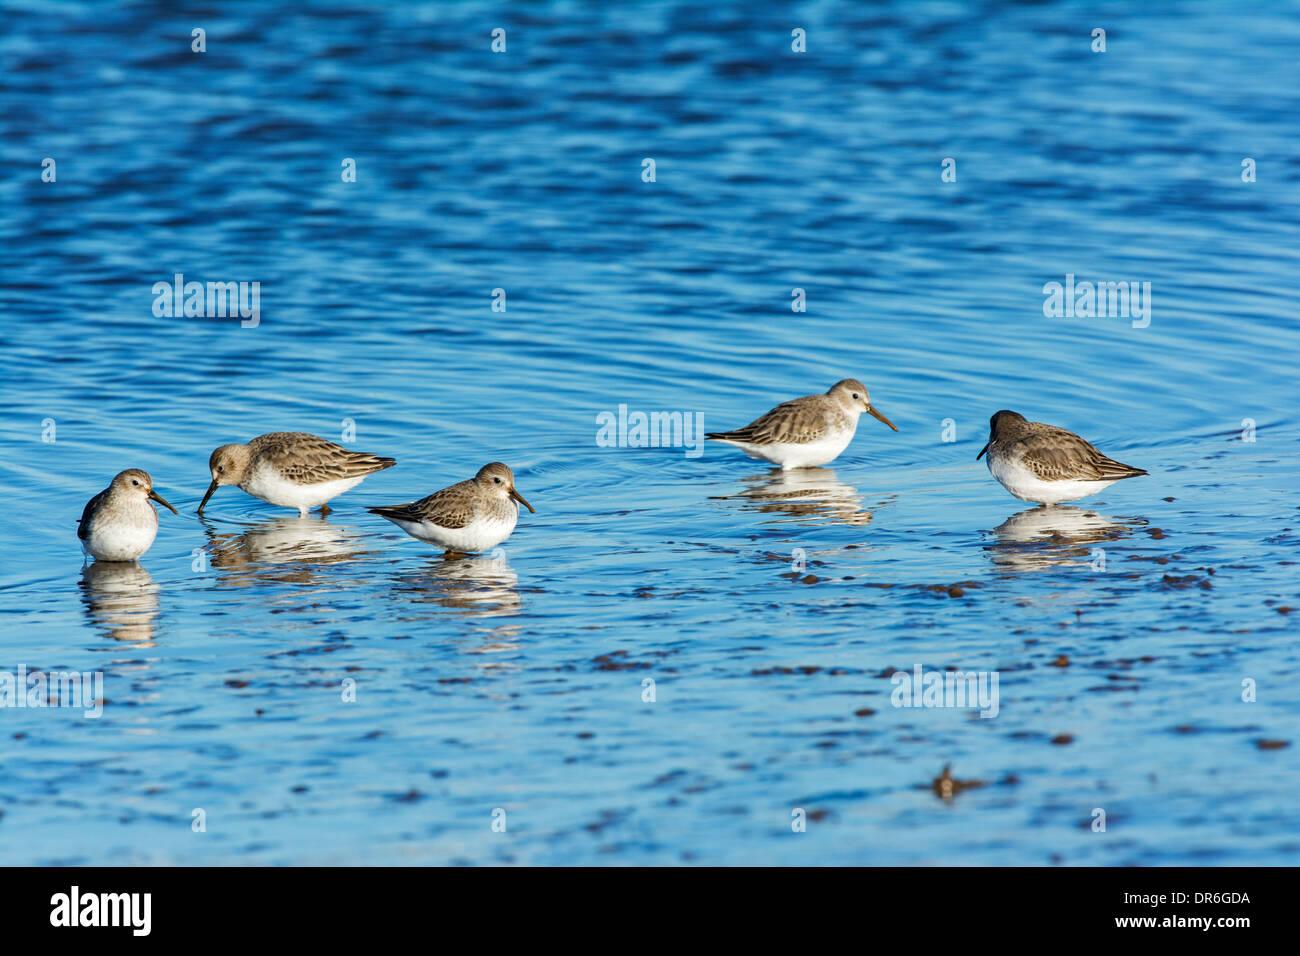 Dunlin (Calidris alpina), feeding on tidal mudflats, Stock Photo